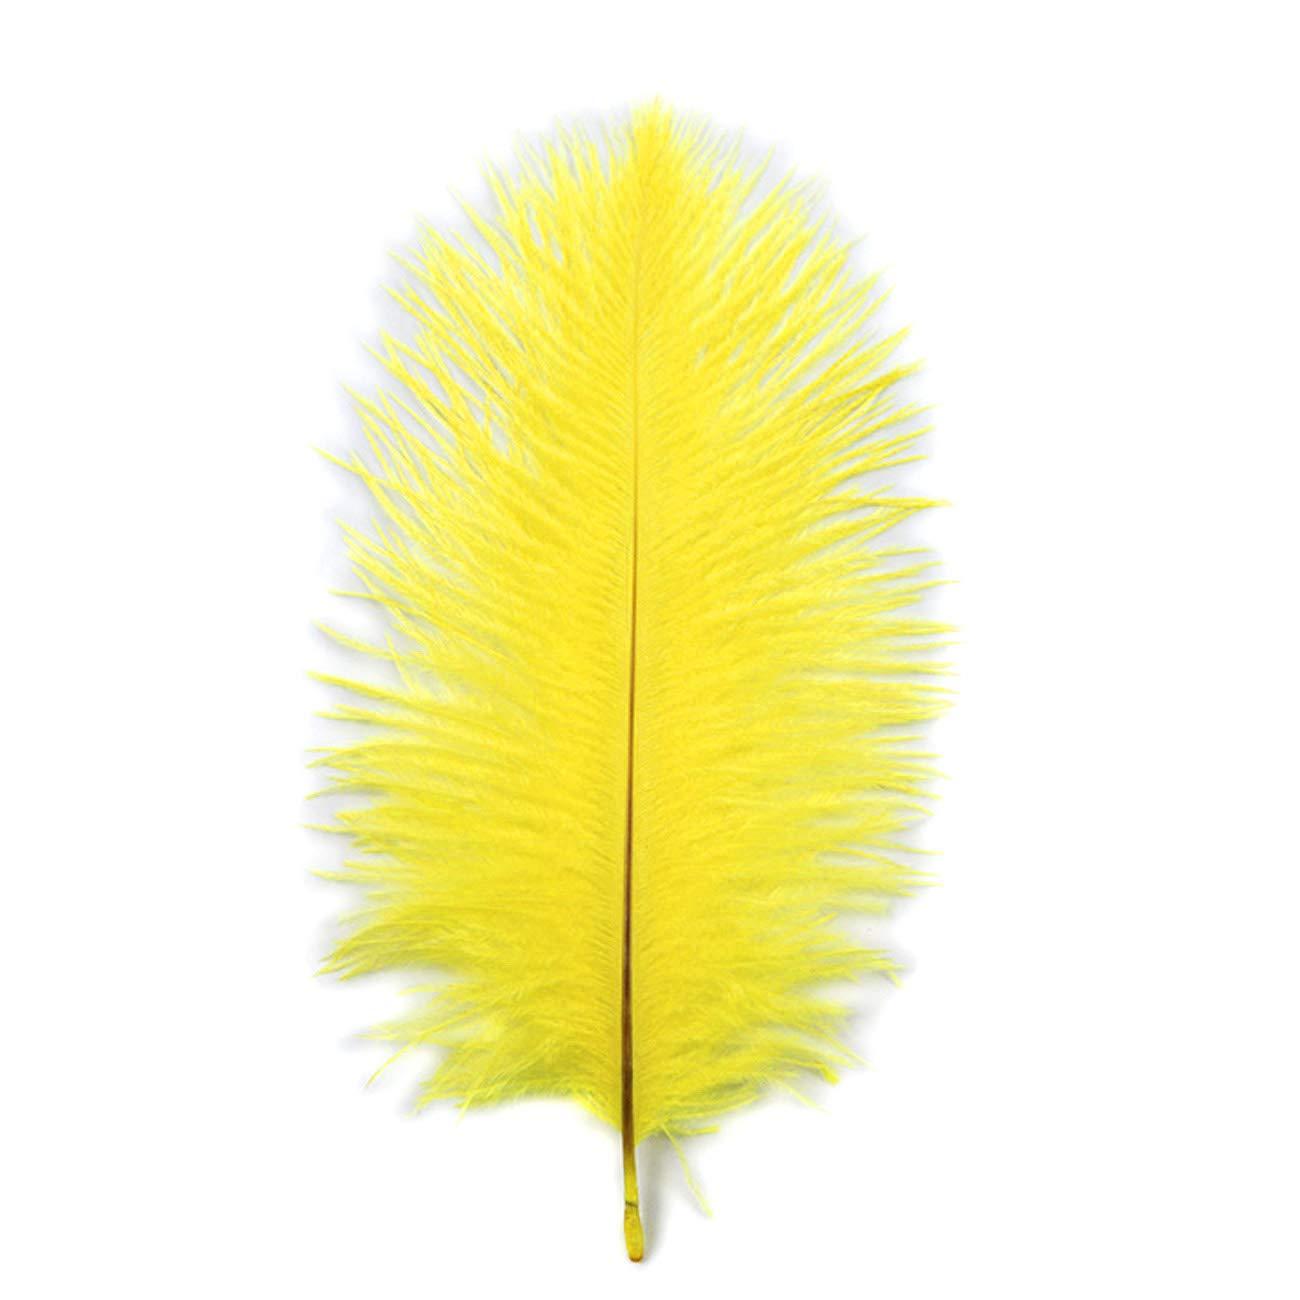 Tinsow 15 Pcs Natural 10-12inch Ostrich Feathers Plume Wedding Centerpieces Home Decoration Festival Supplies 25-30cm White